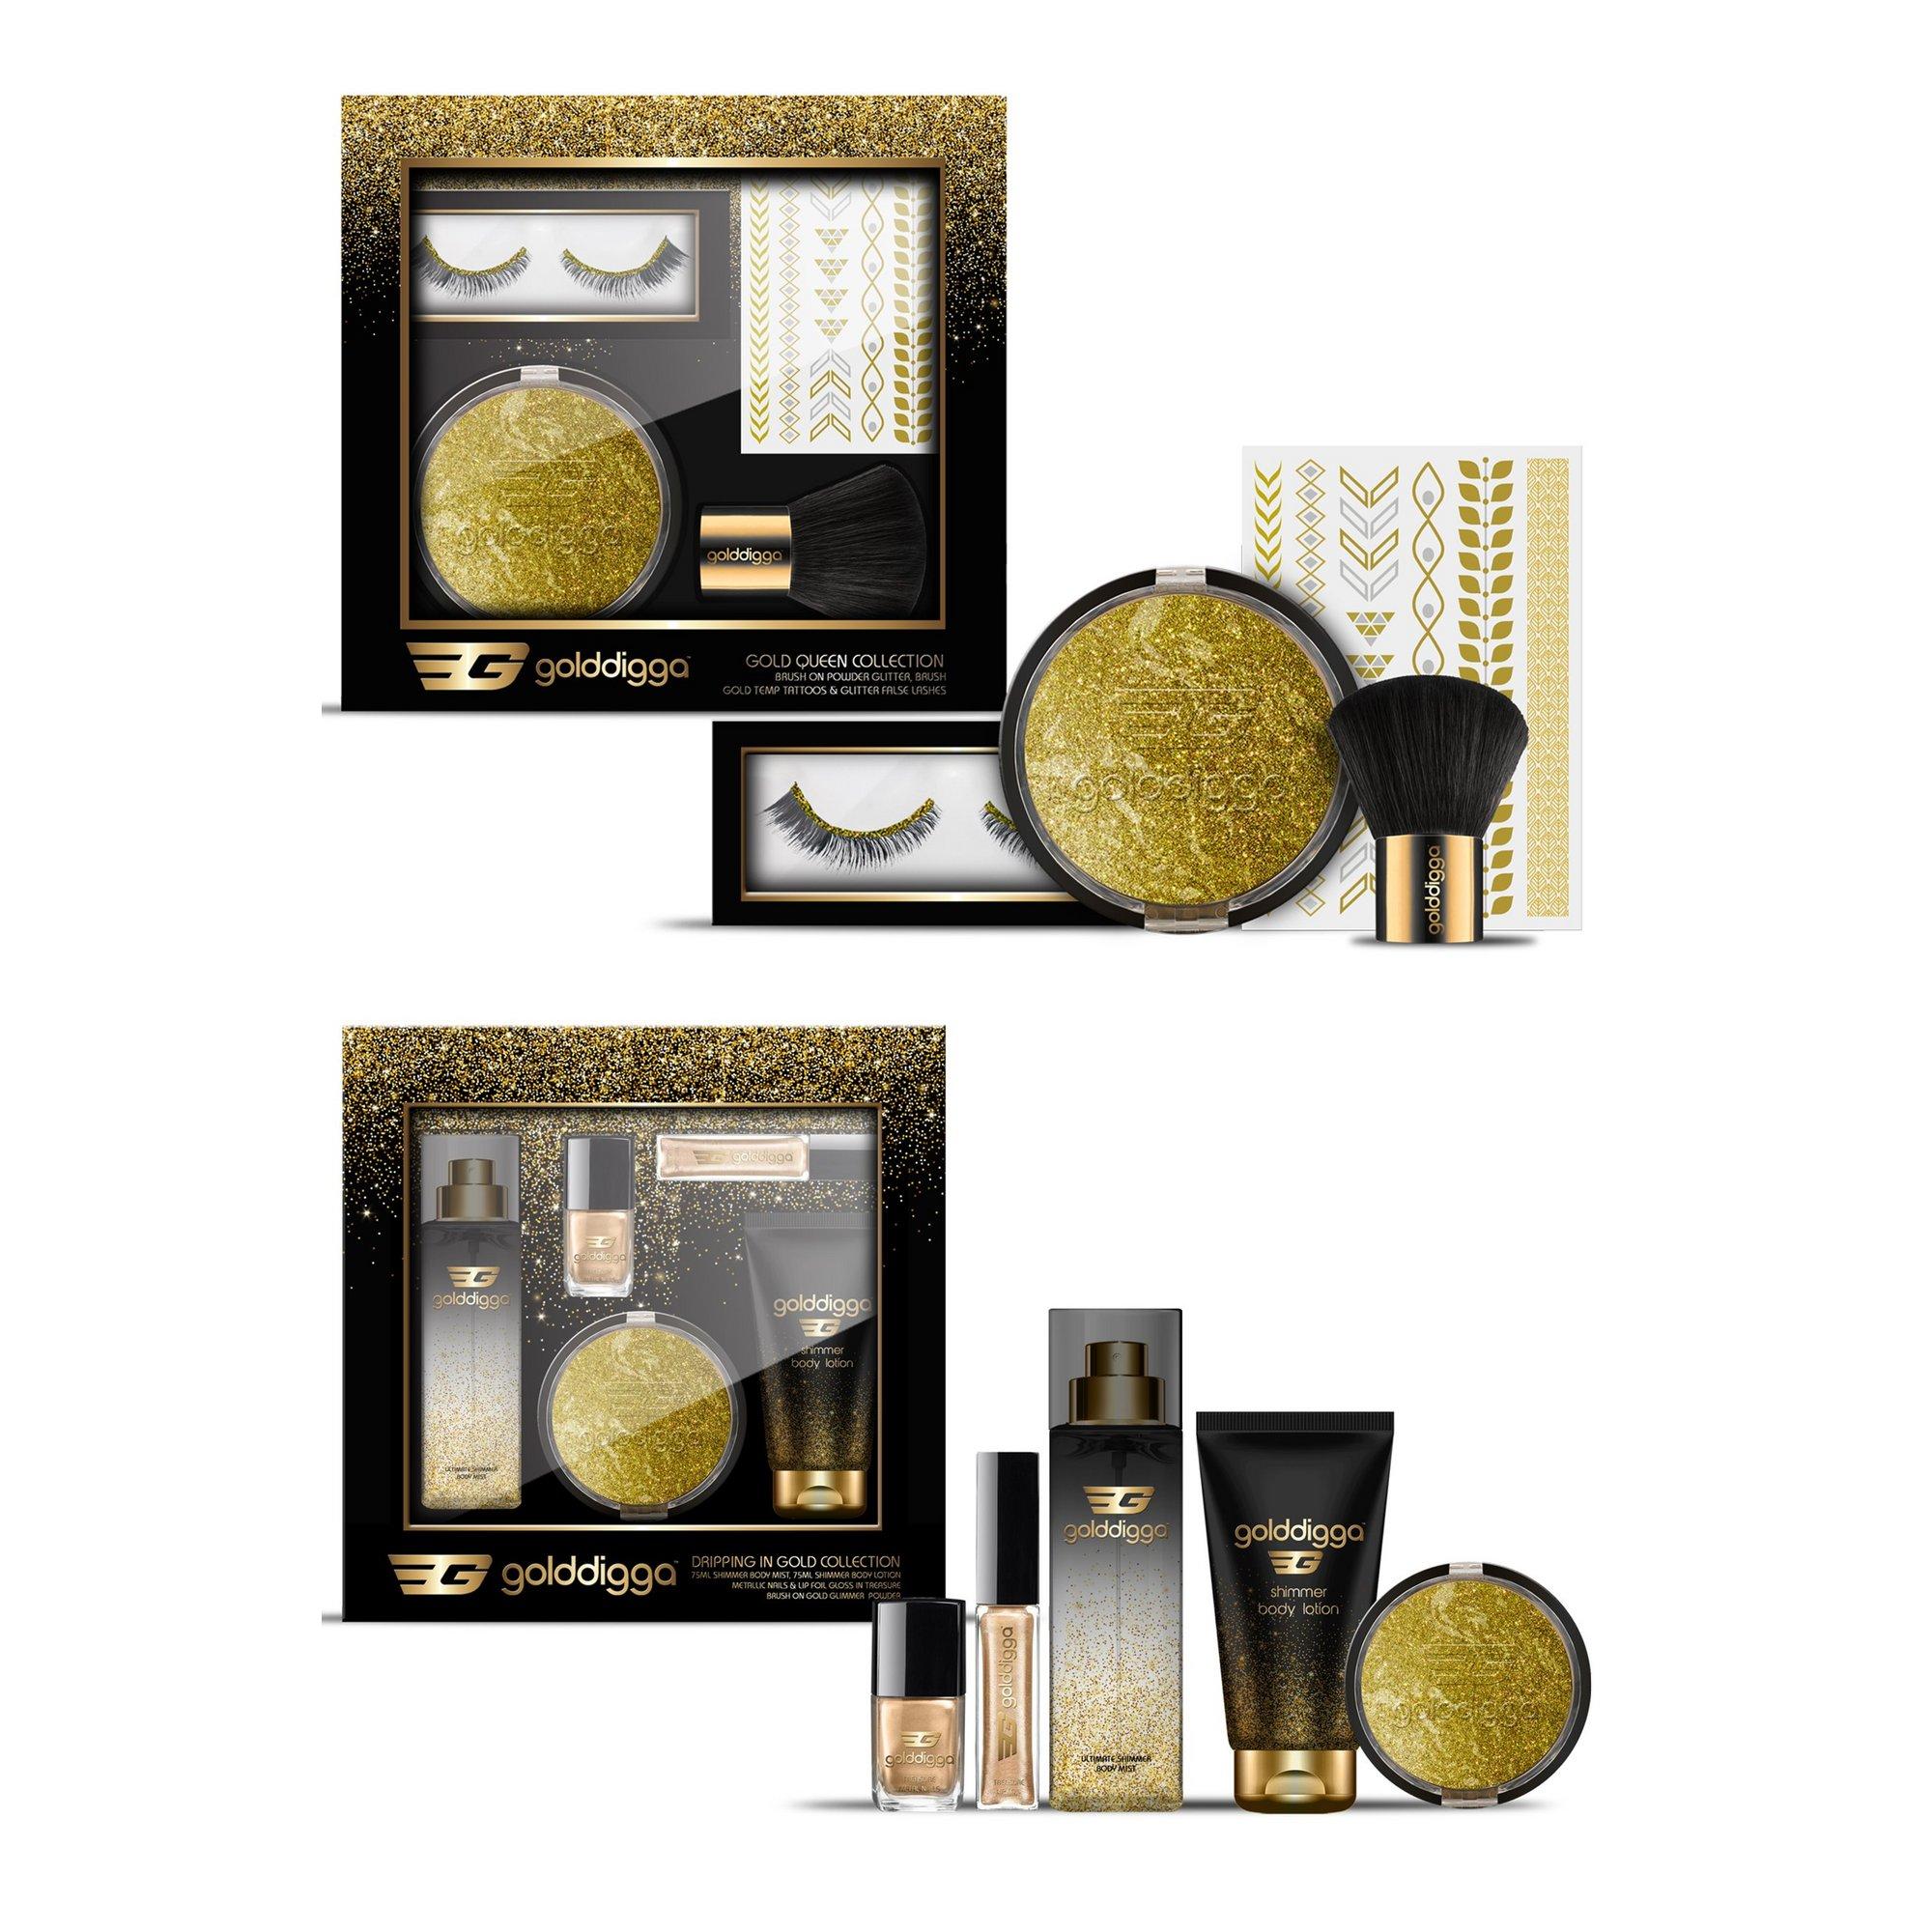 Image of Golddigga Gold Collection